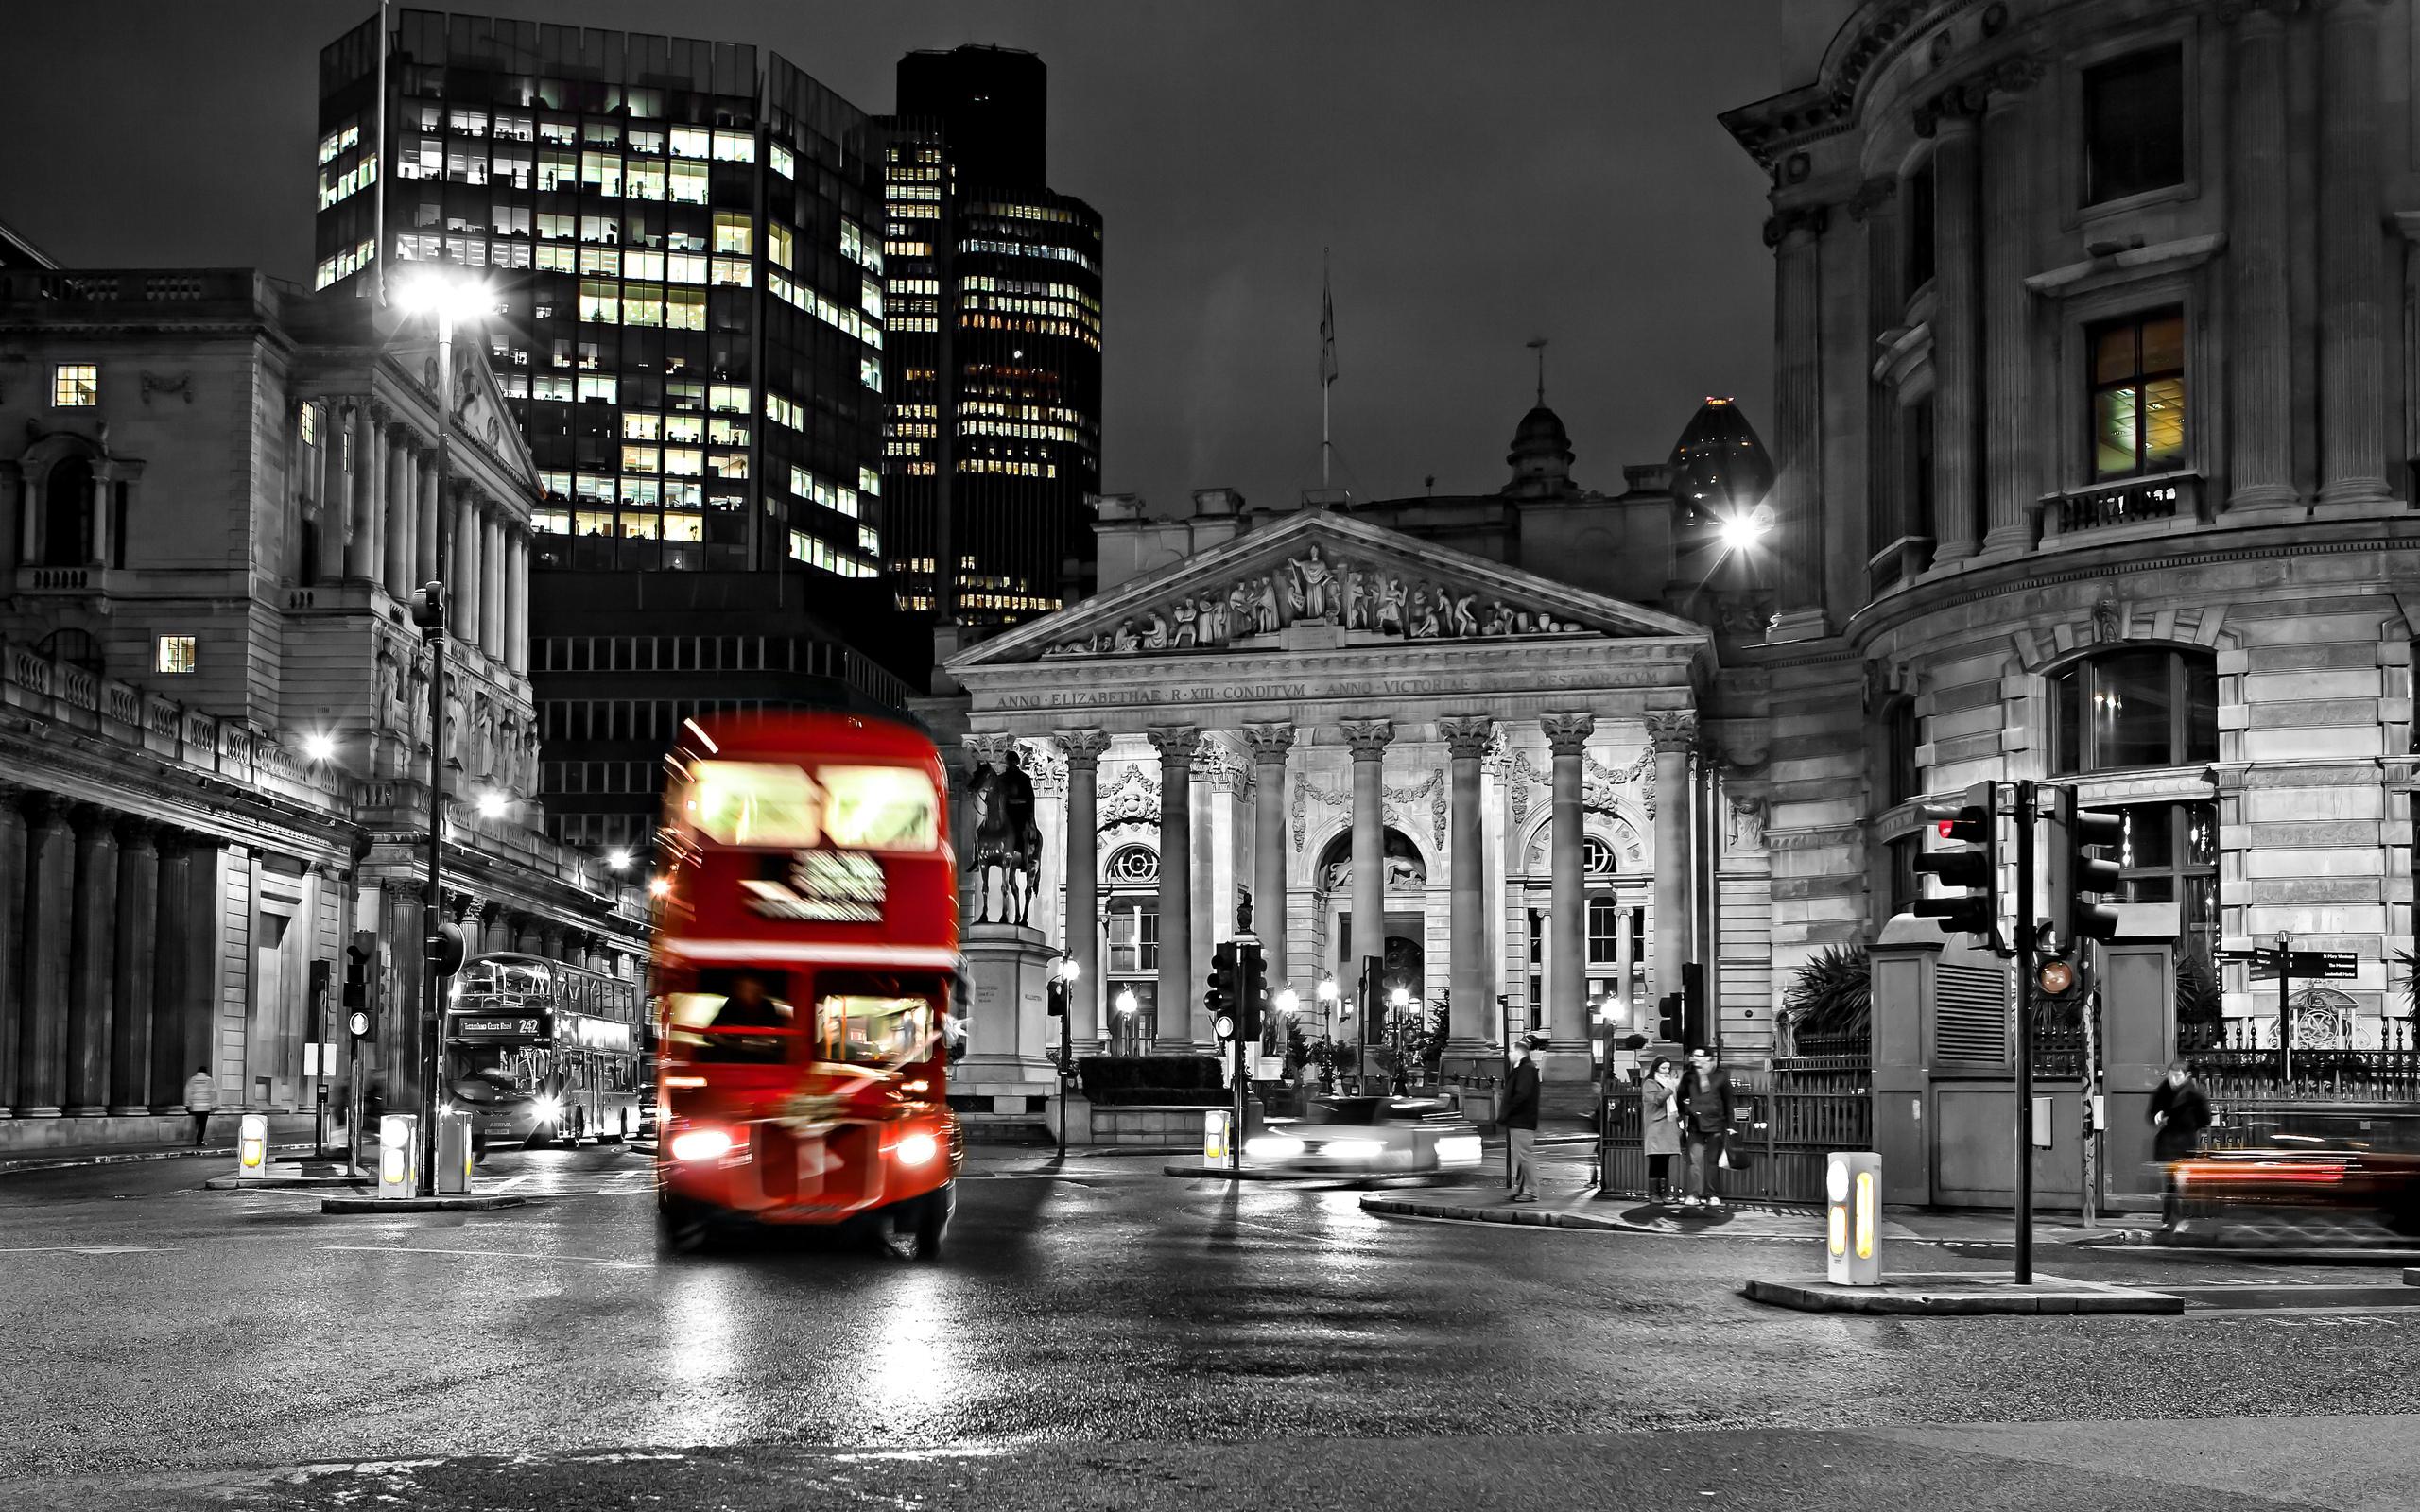 road blur night bus england london black and white street city 2560x1600